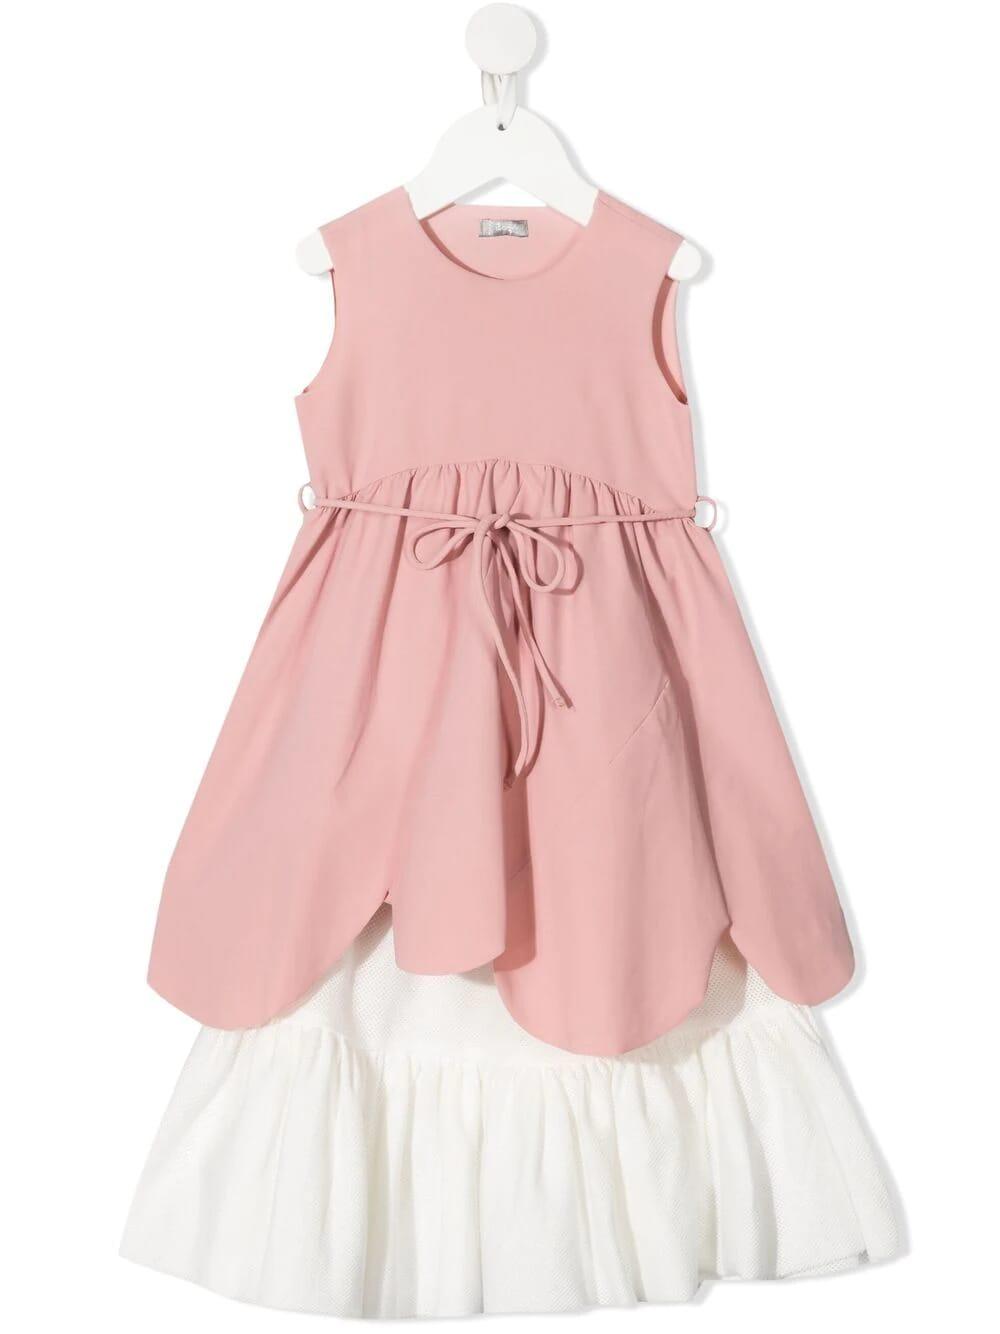 Tiered Drawstring Dress